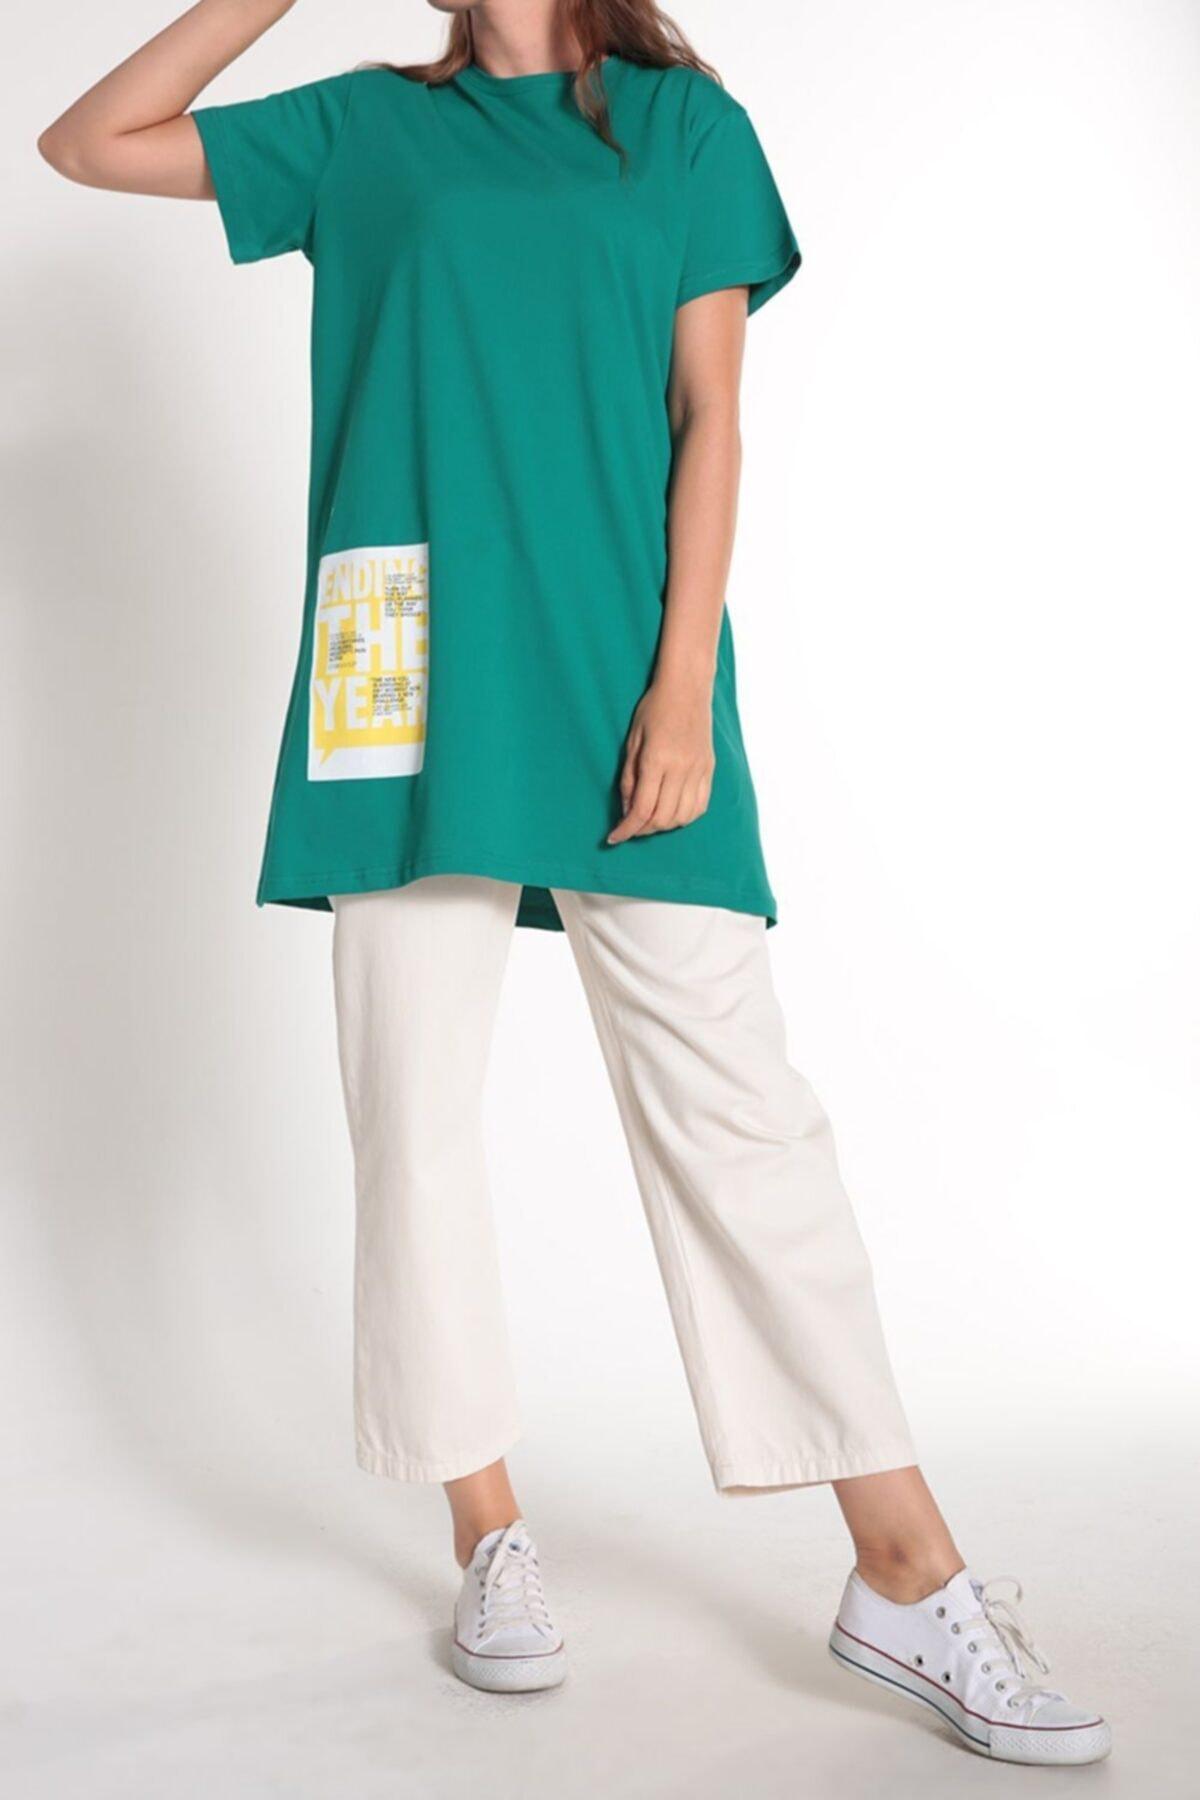 ALLDAY Zümrüt Yeşili Kısa Kol Baskılı T-shirt 2